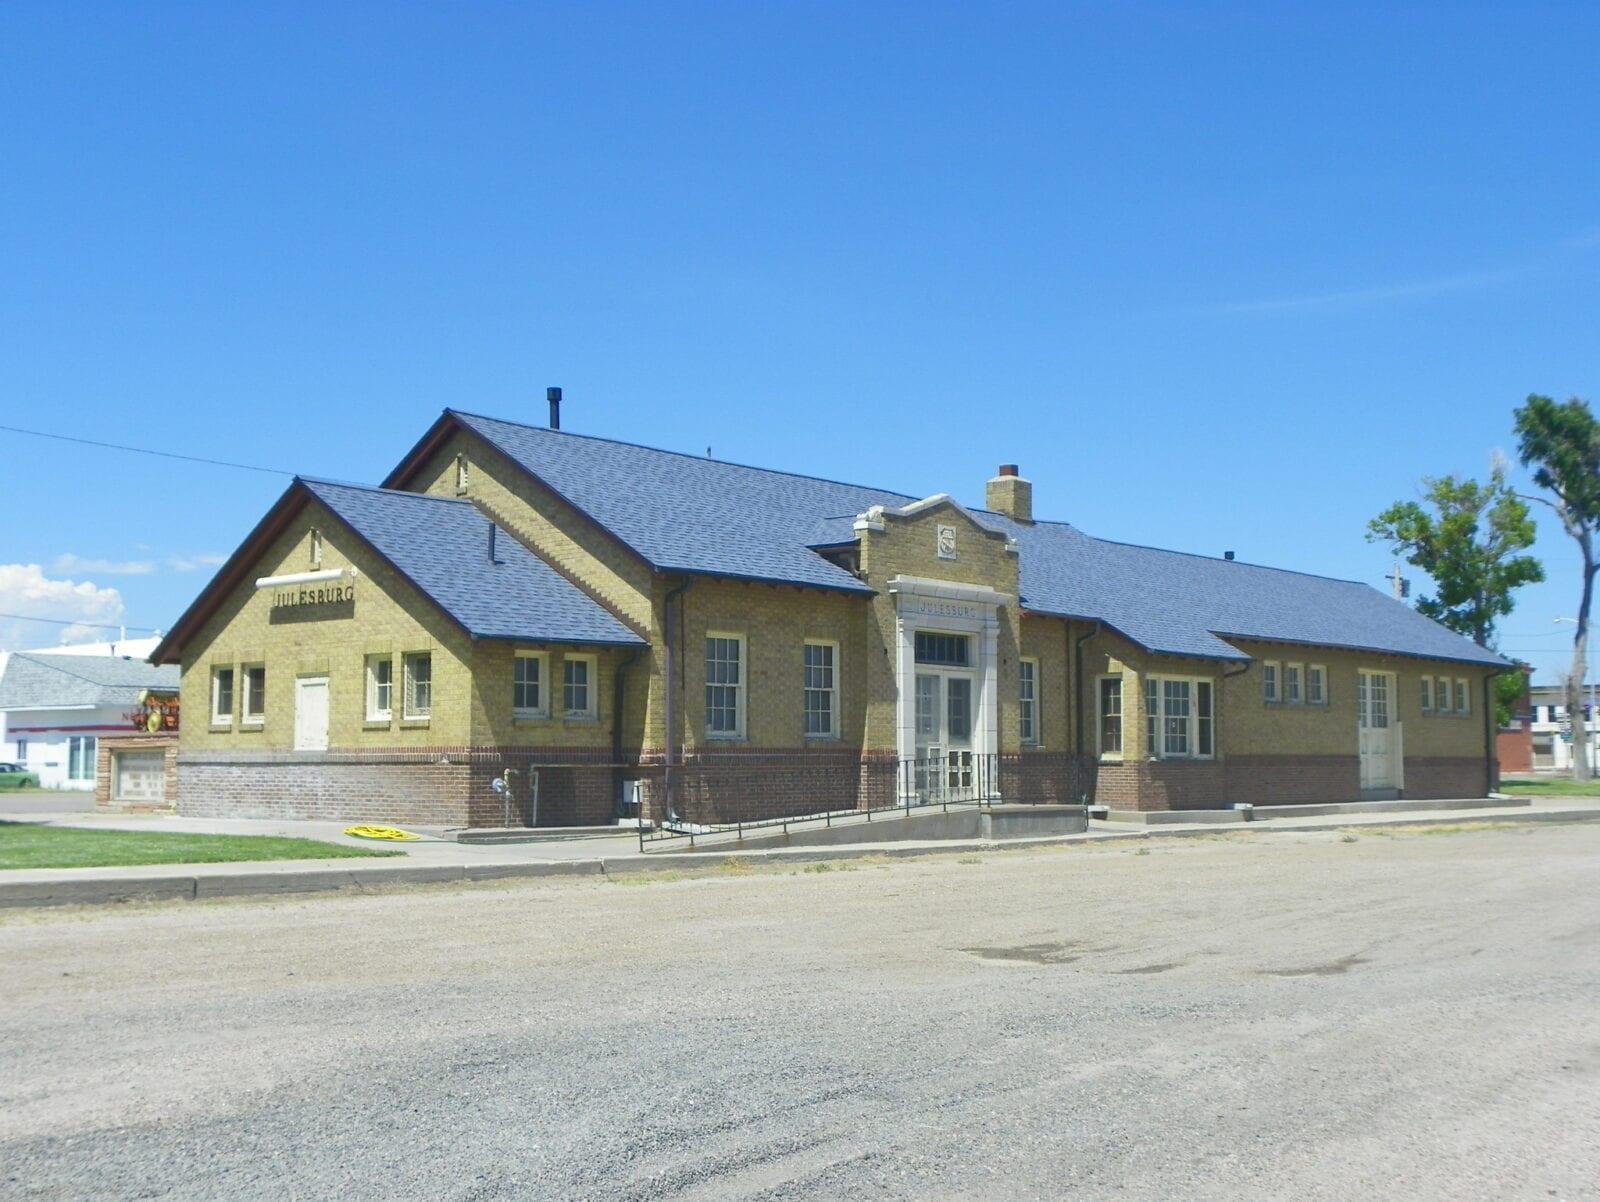 image of old railroad depot in Julseburg